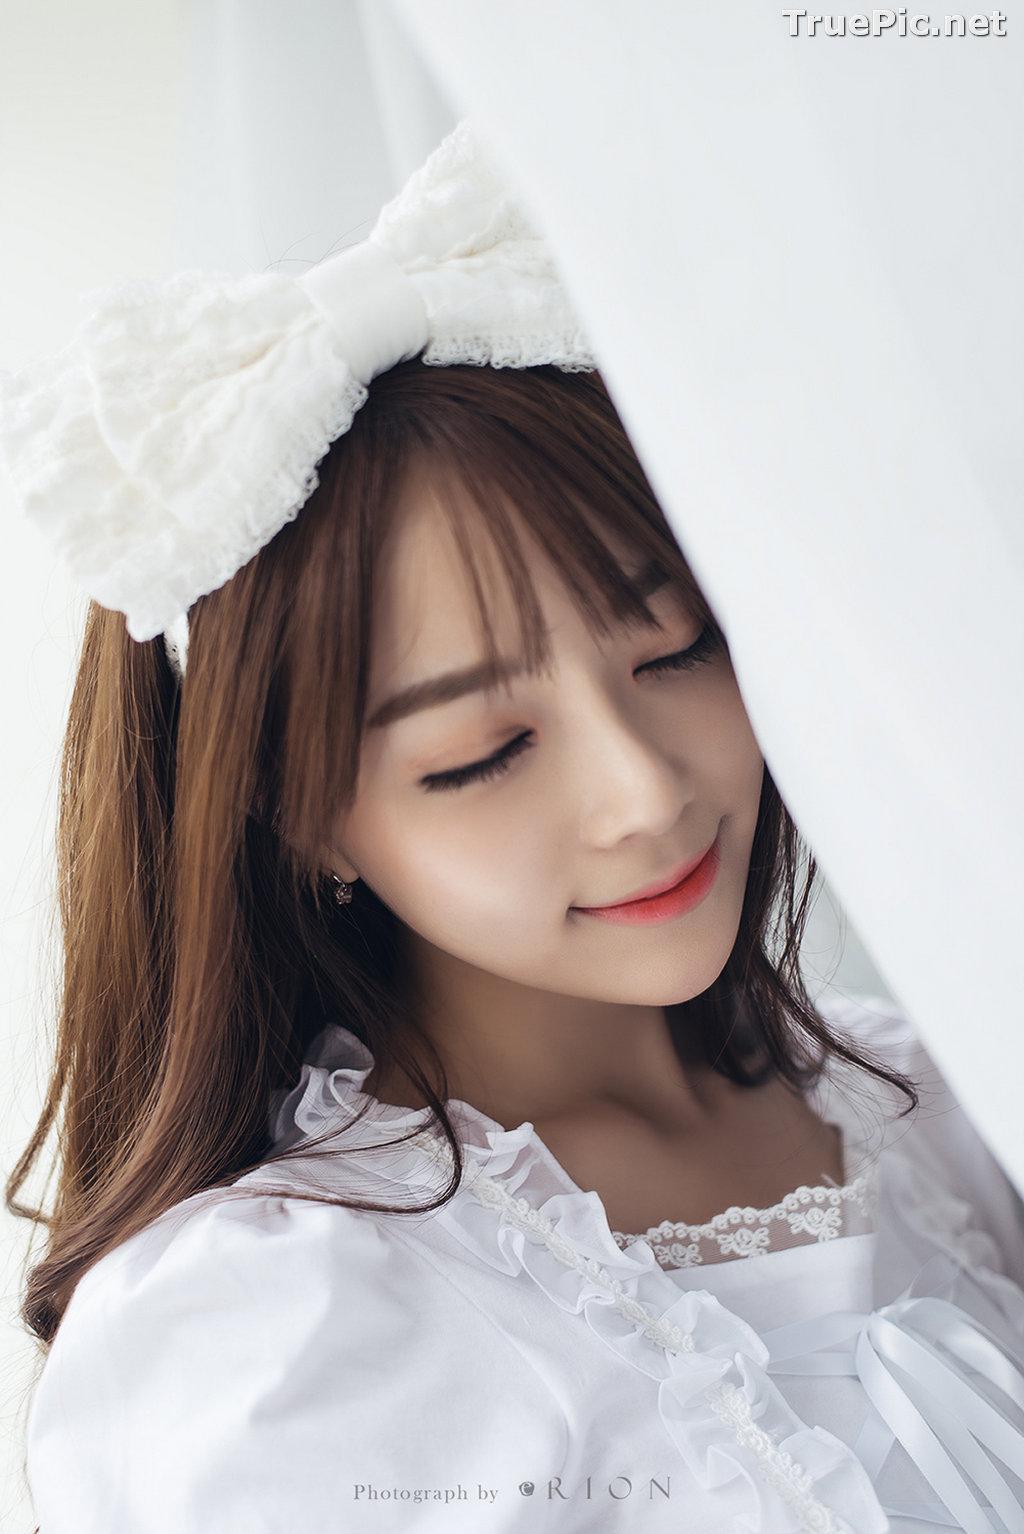 Image Korean Beautiful Model - Ji Yeon - My Cute Princess - TruePic.net - Picture-4